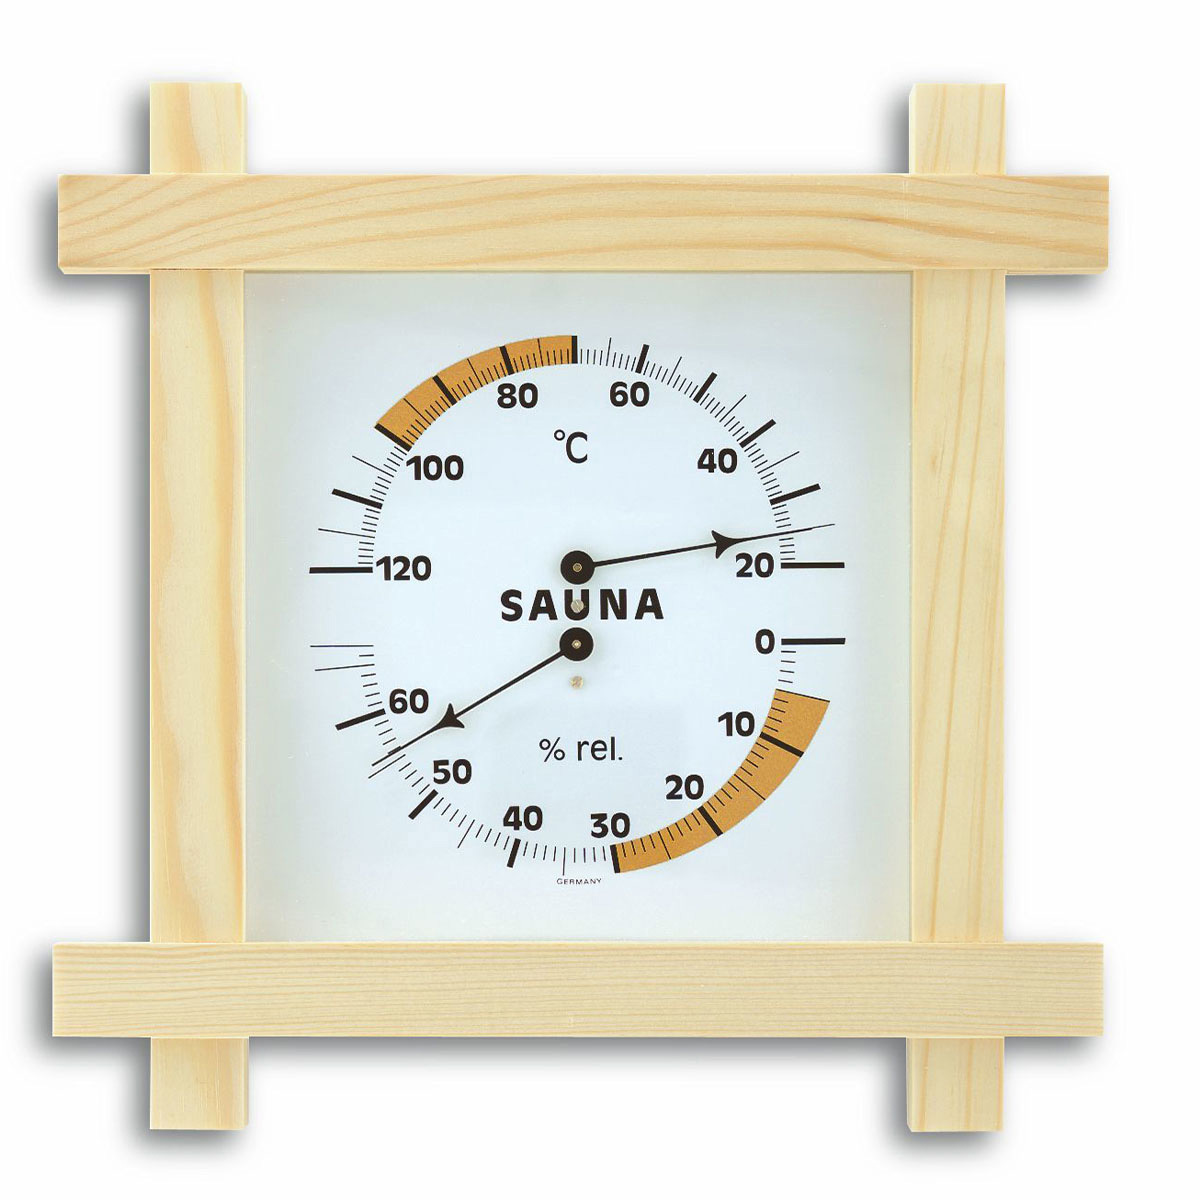 40-1008-analoges-sauna-thermo-hygrometer-mit-holzrahmen-1200x1200px.jpg